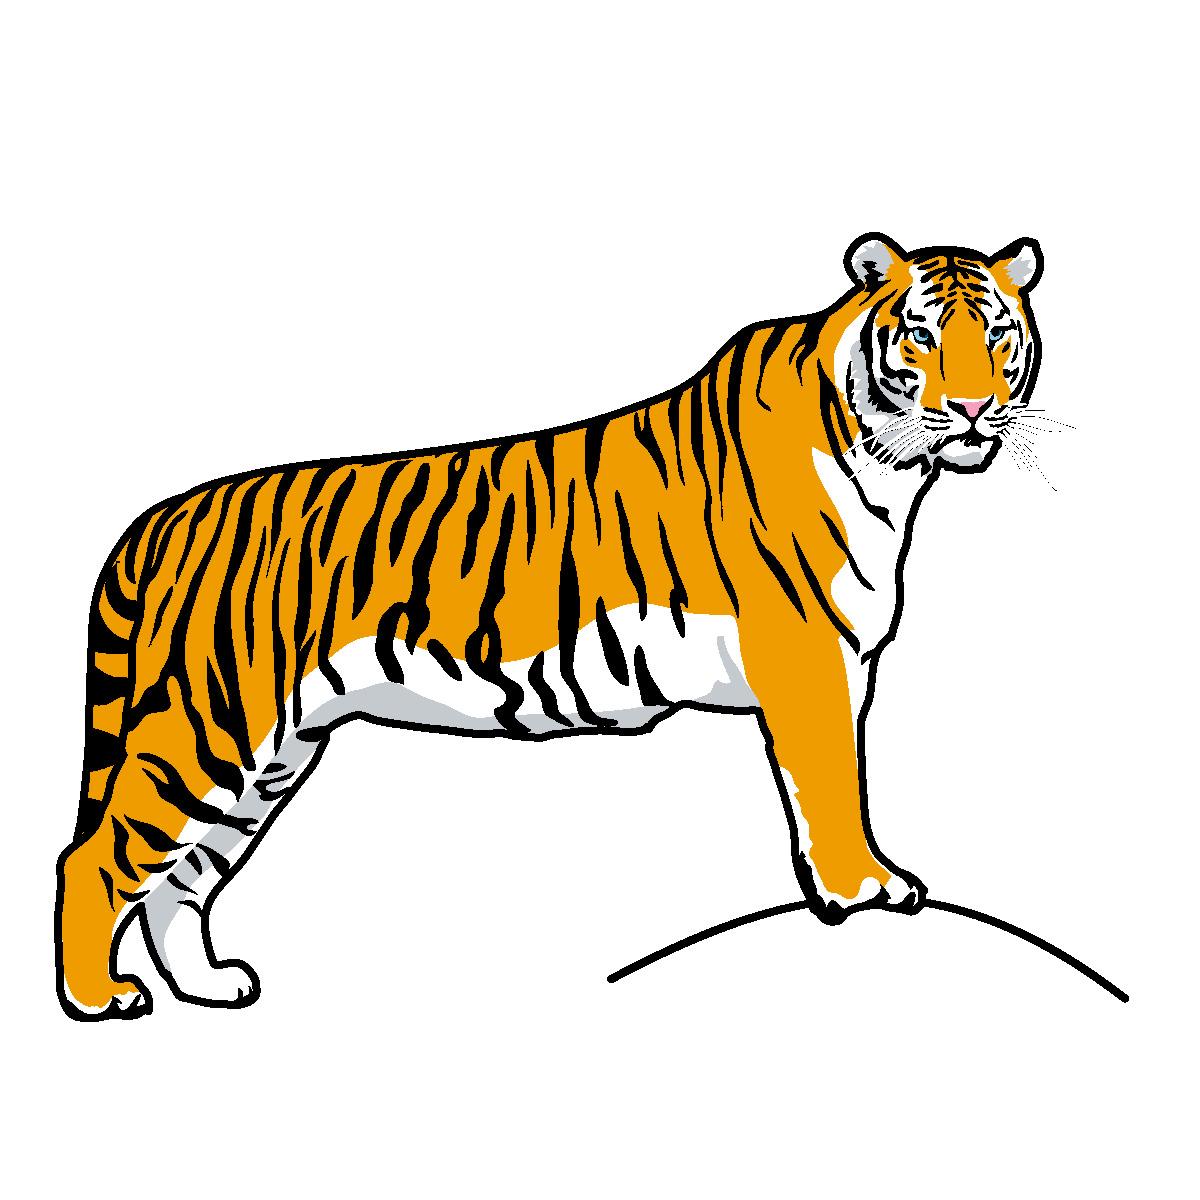 1200x1200 Tiger clip art free clipart images 2